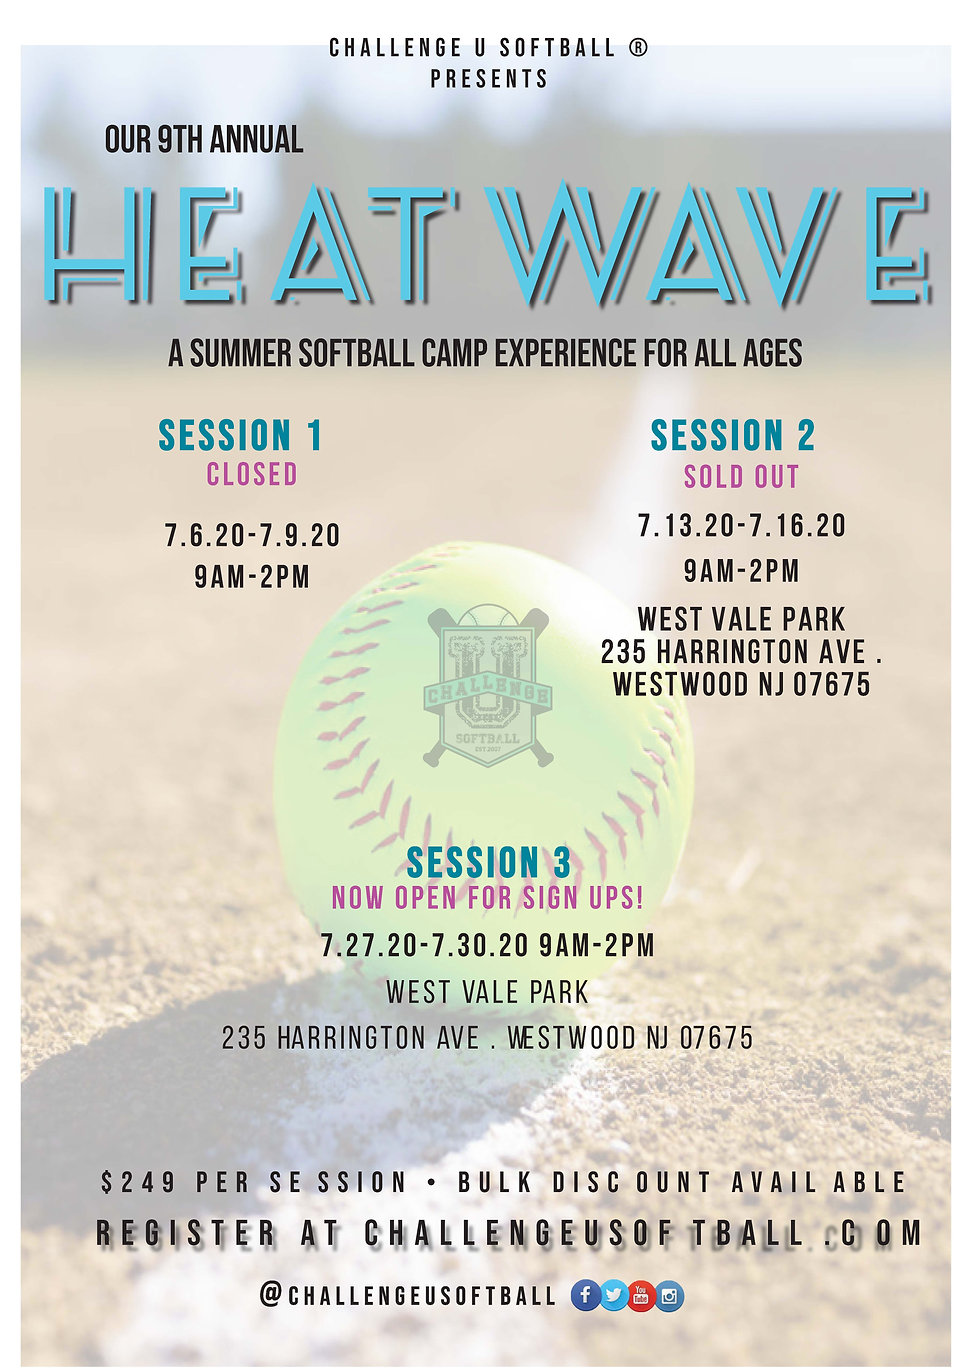 CU Session 3 2020 Summer Softball Camp H